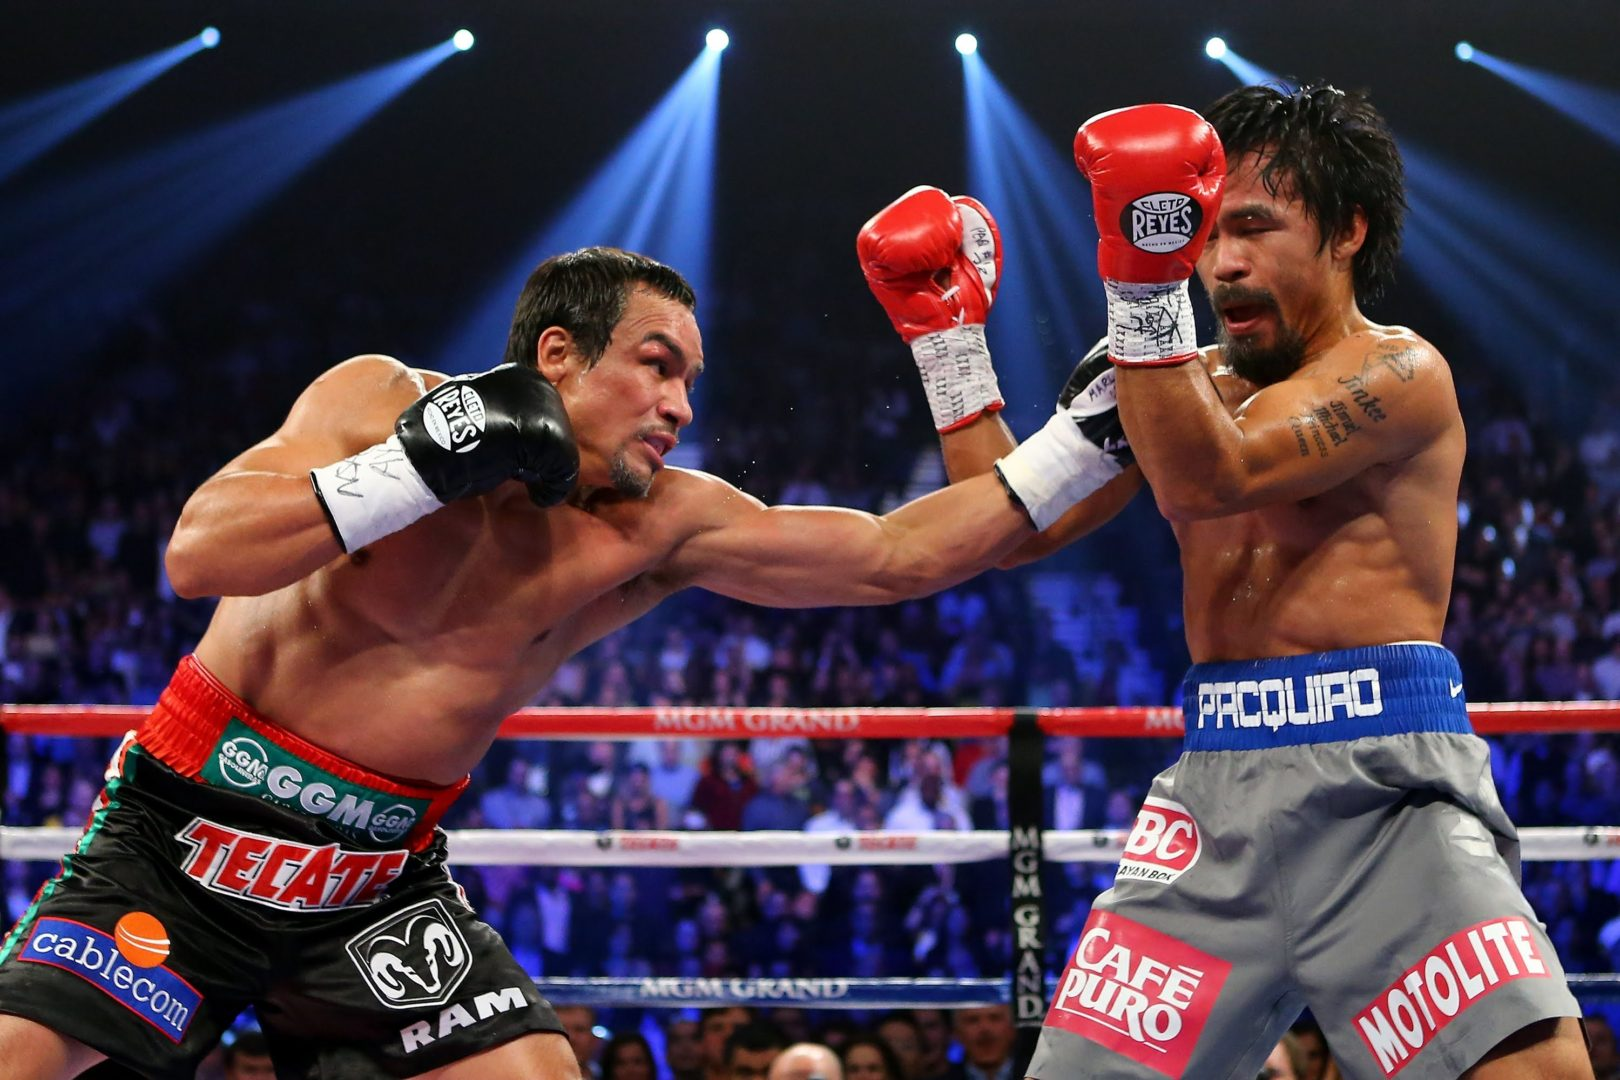 Márquez vs Pacquiao III